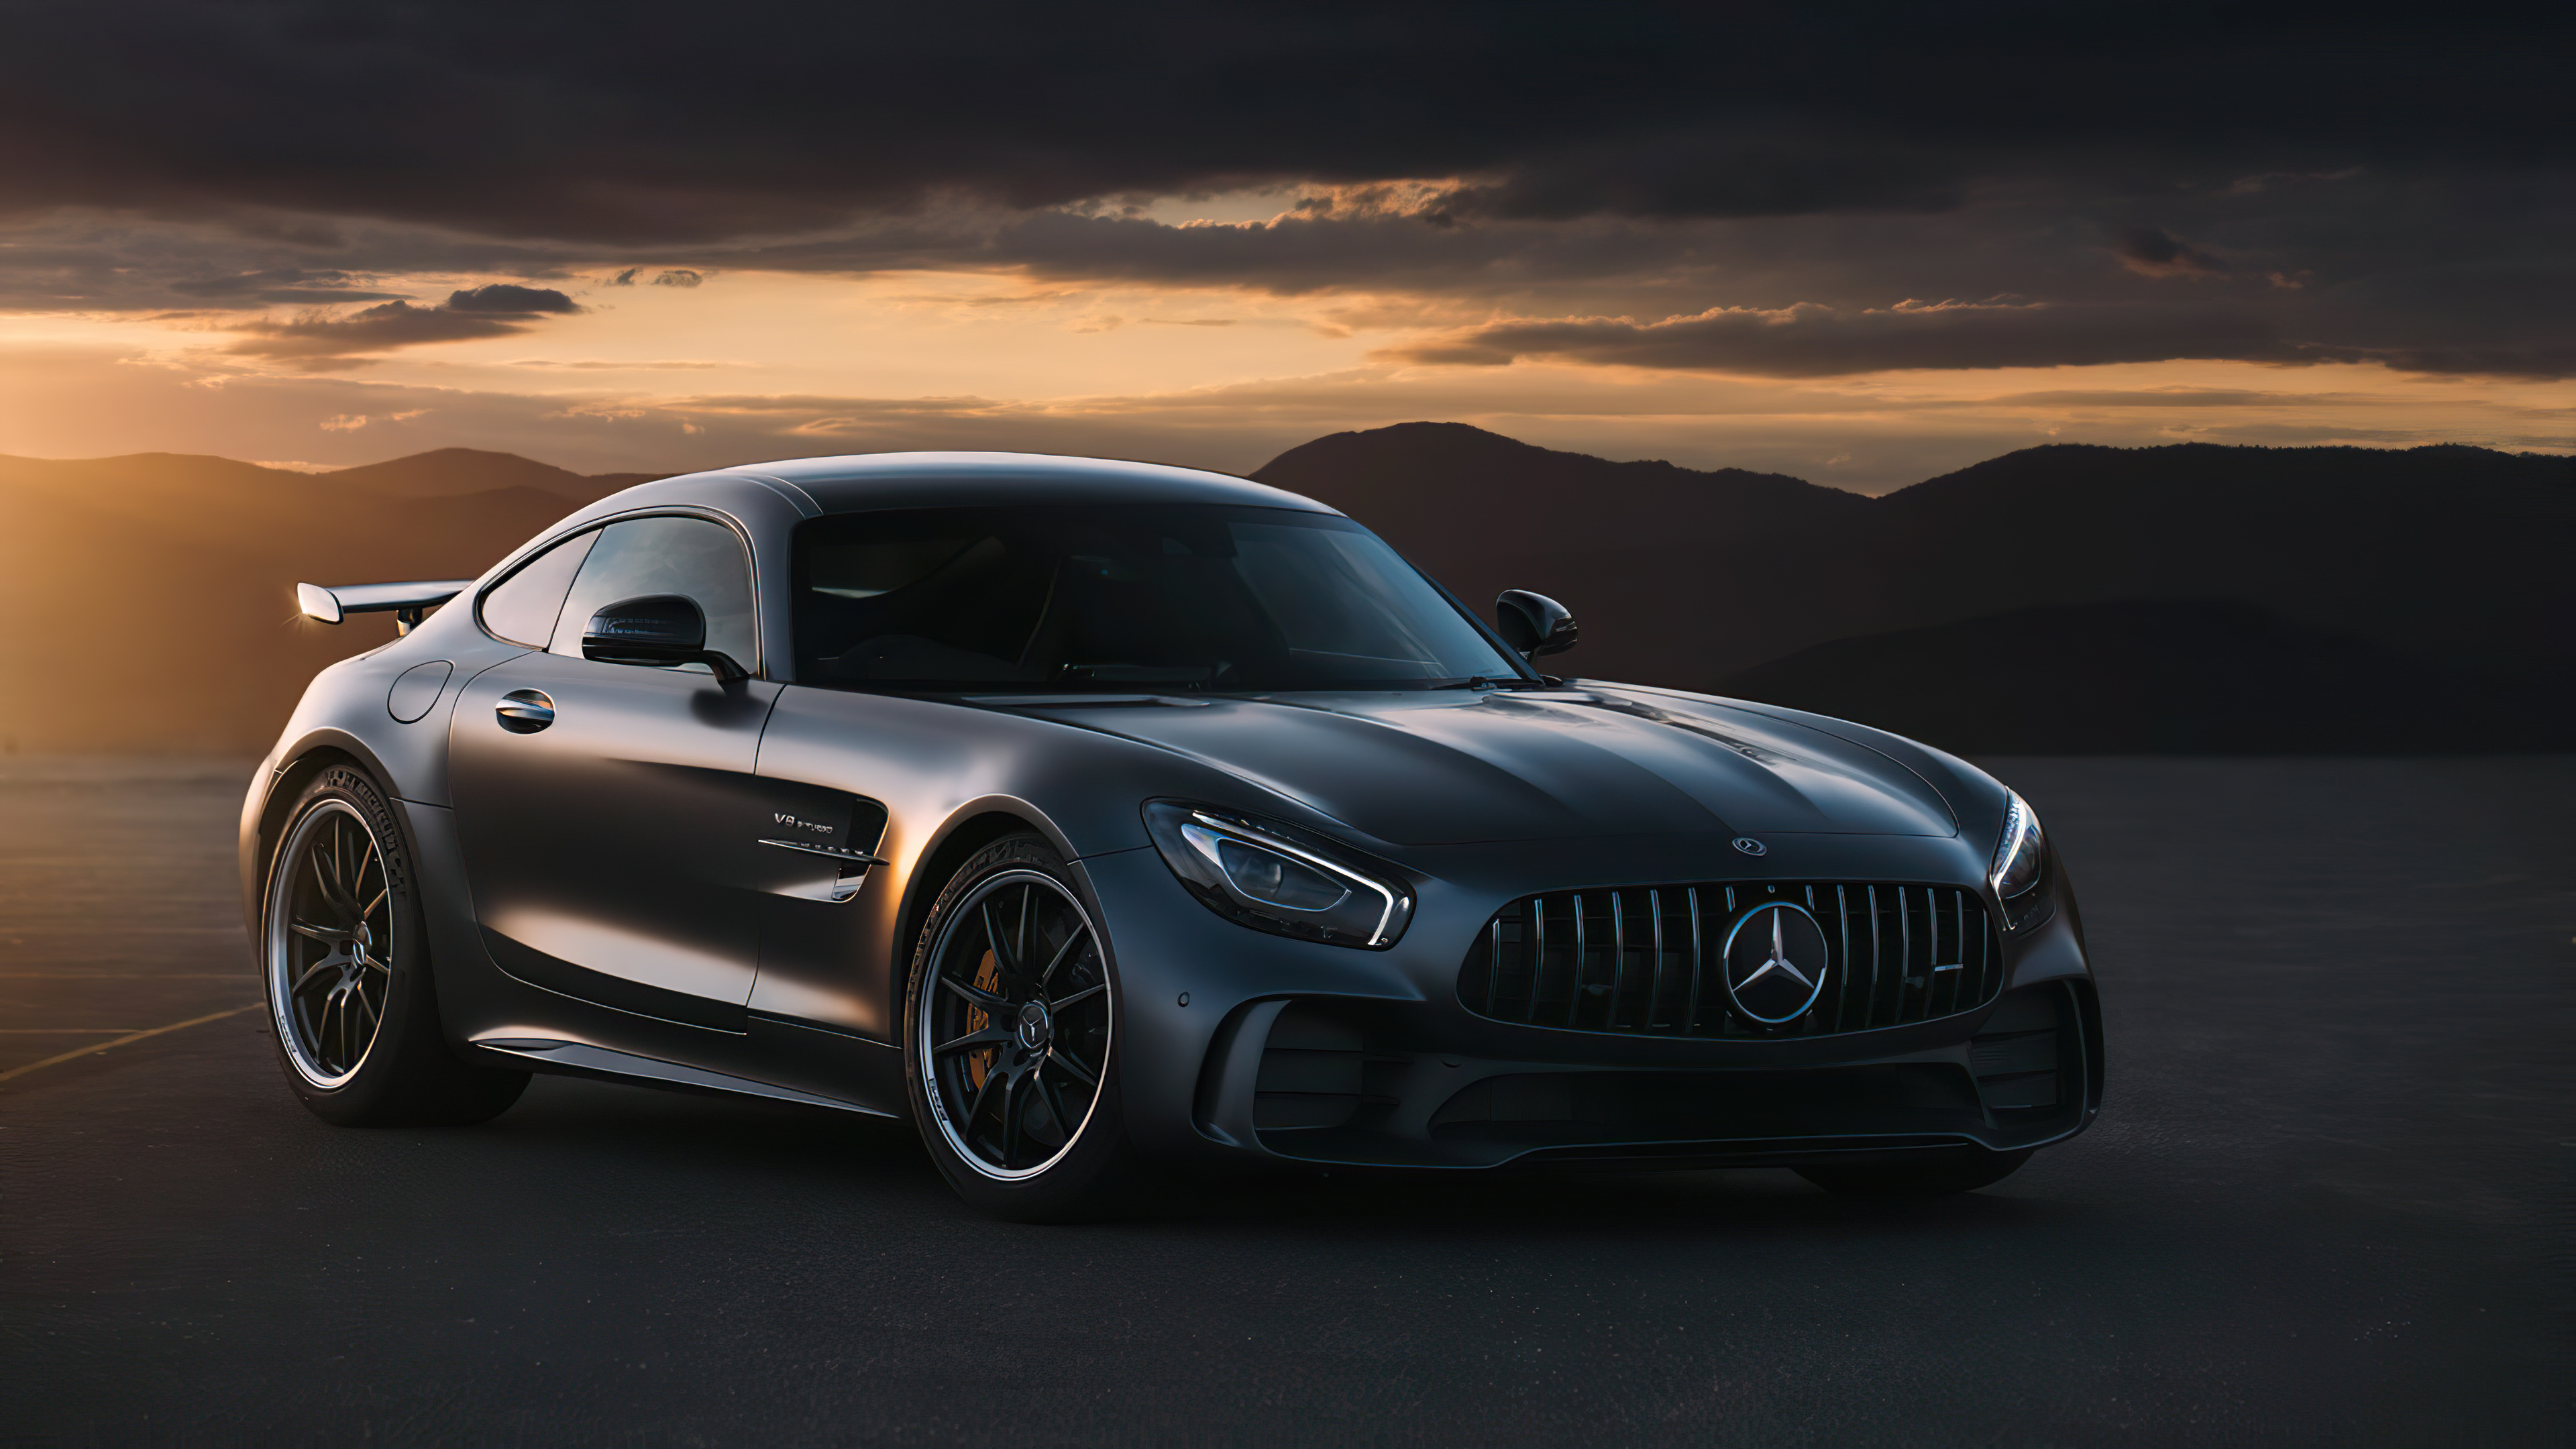 mercedes benz amg gt 2020 4k 1608819638 - Mercedes Benz Amg Gt 2020 4k - Mercedes Benz Amg Gt 2020 4k wallpapers